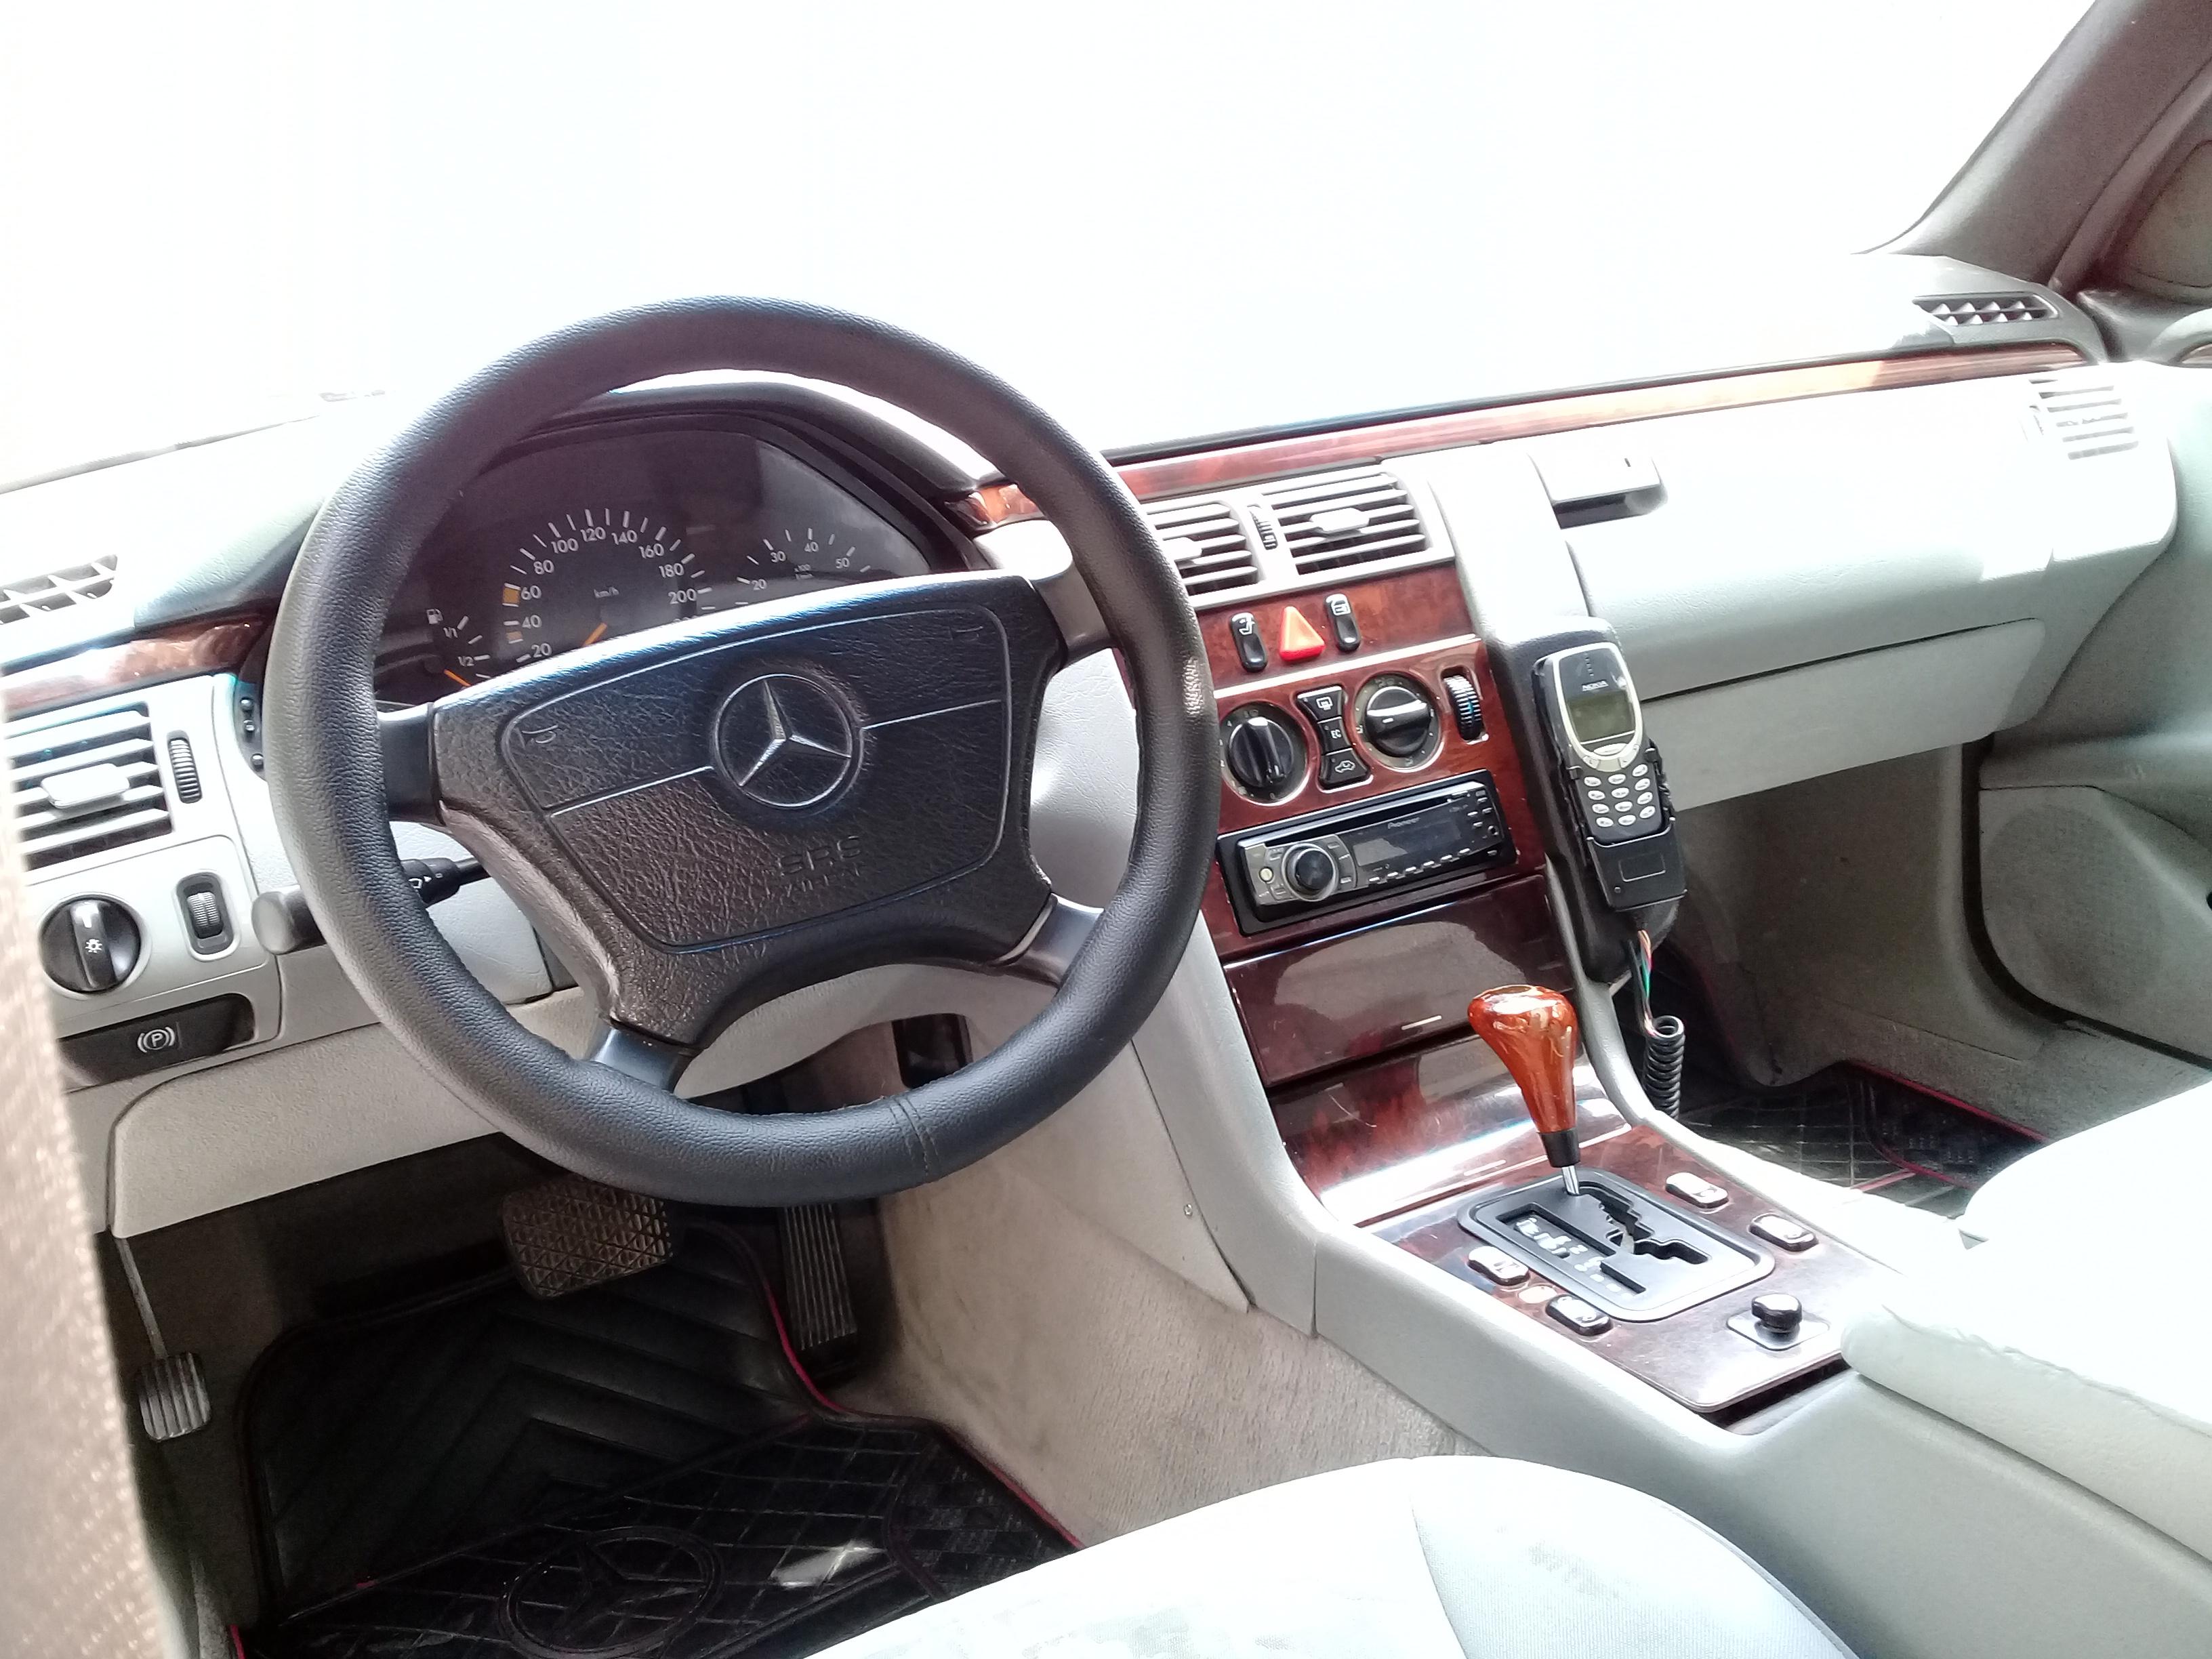 Mercedes-Benz E 230 2.3(lt) 1996 İkinci əl  $5300